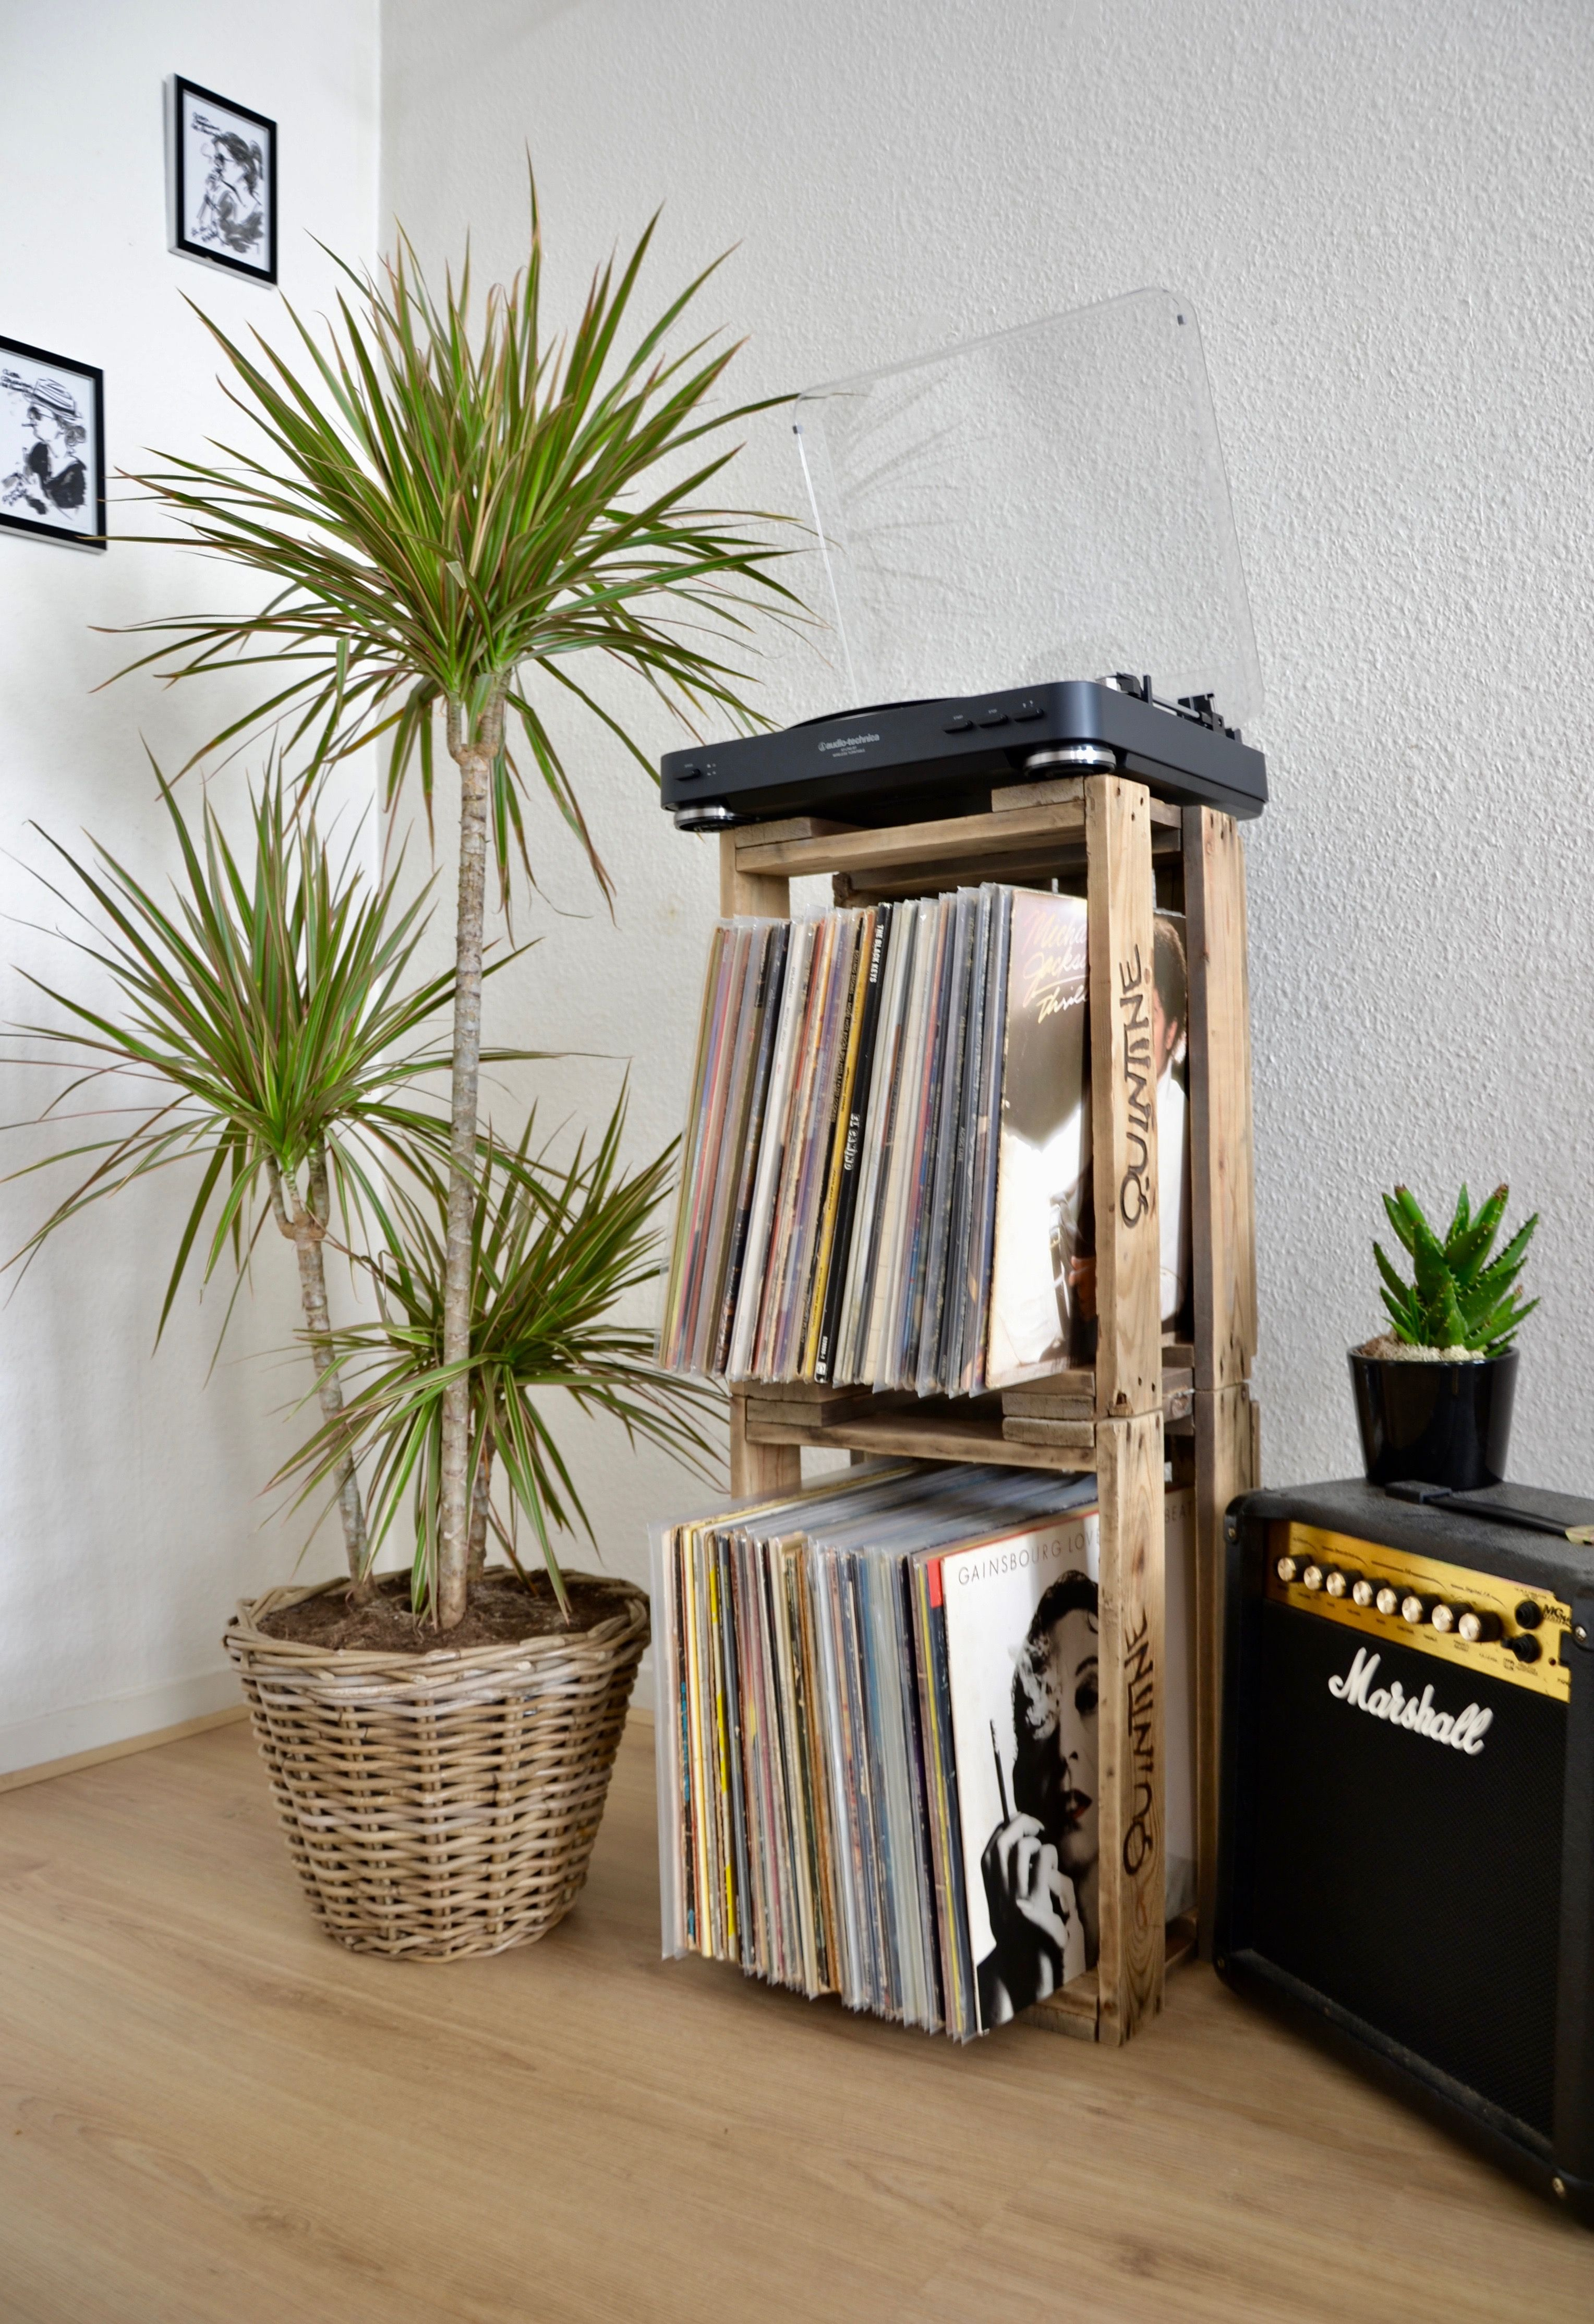 Meuble A Vinyles Ou Meuble A Rangement Type Bibliotheque Fait A